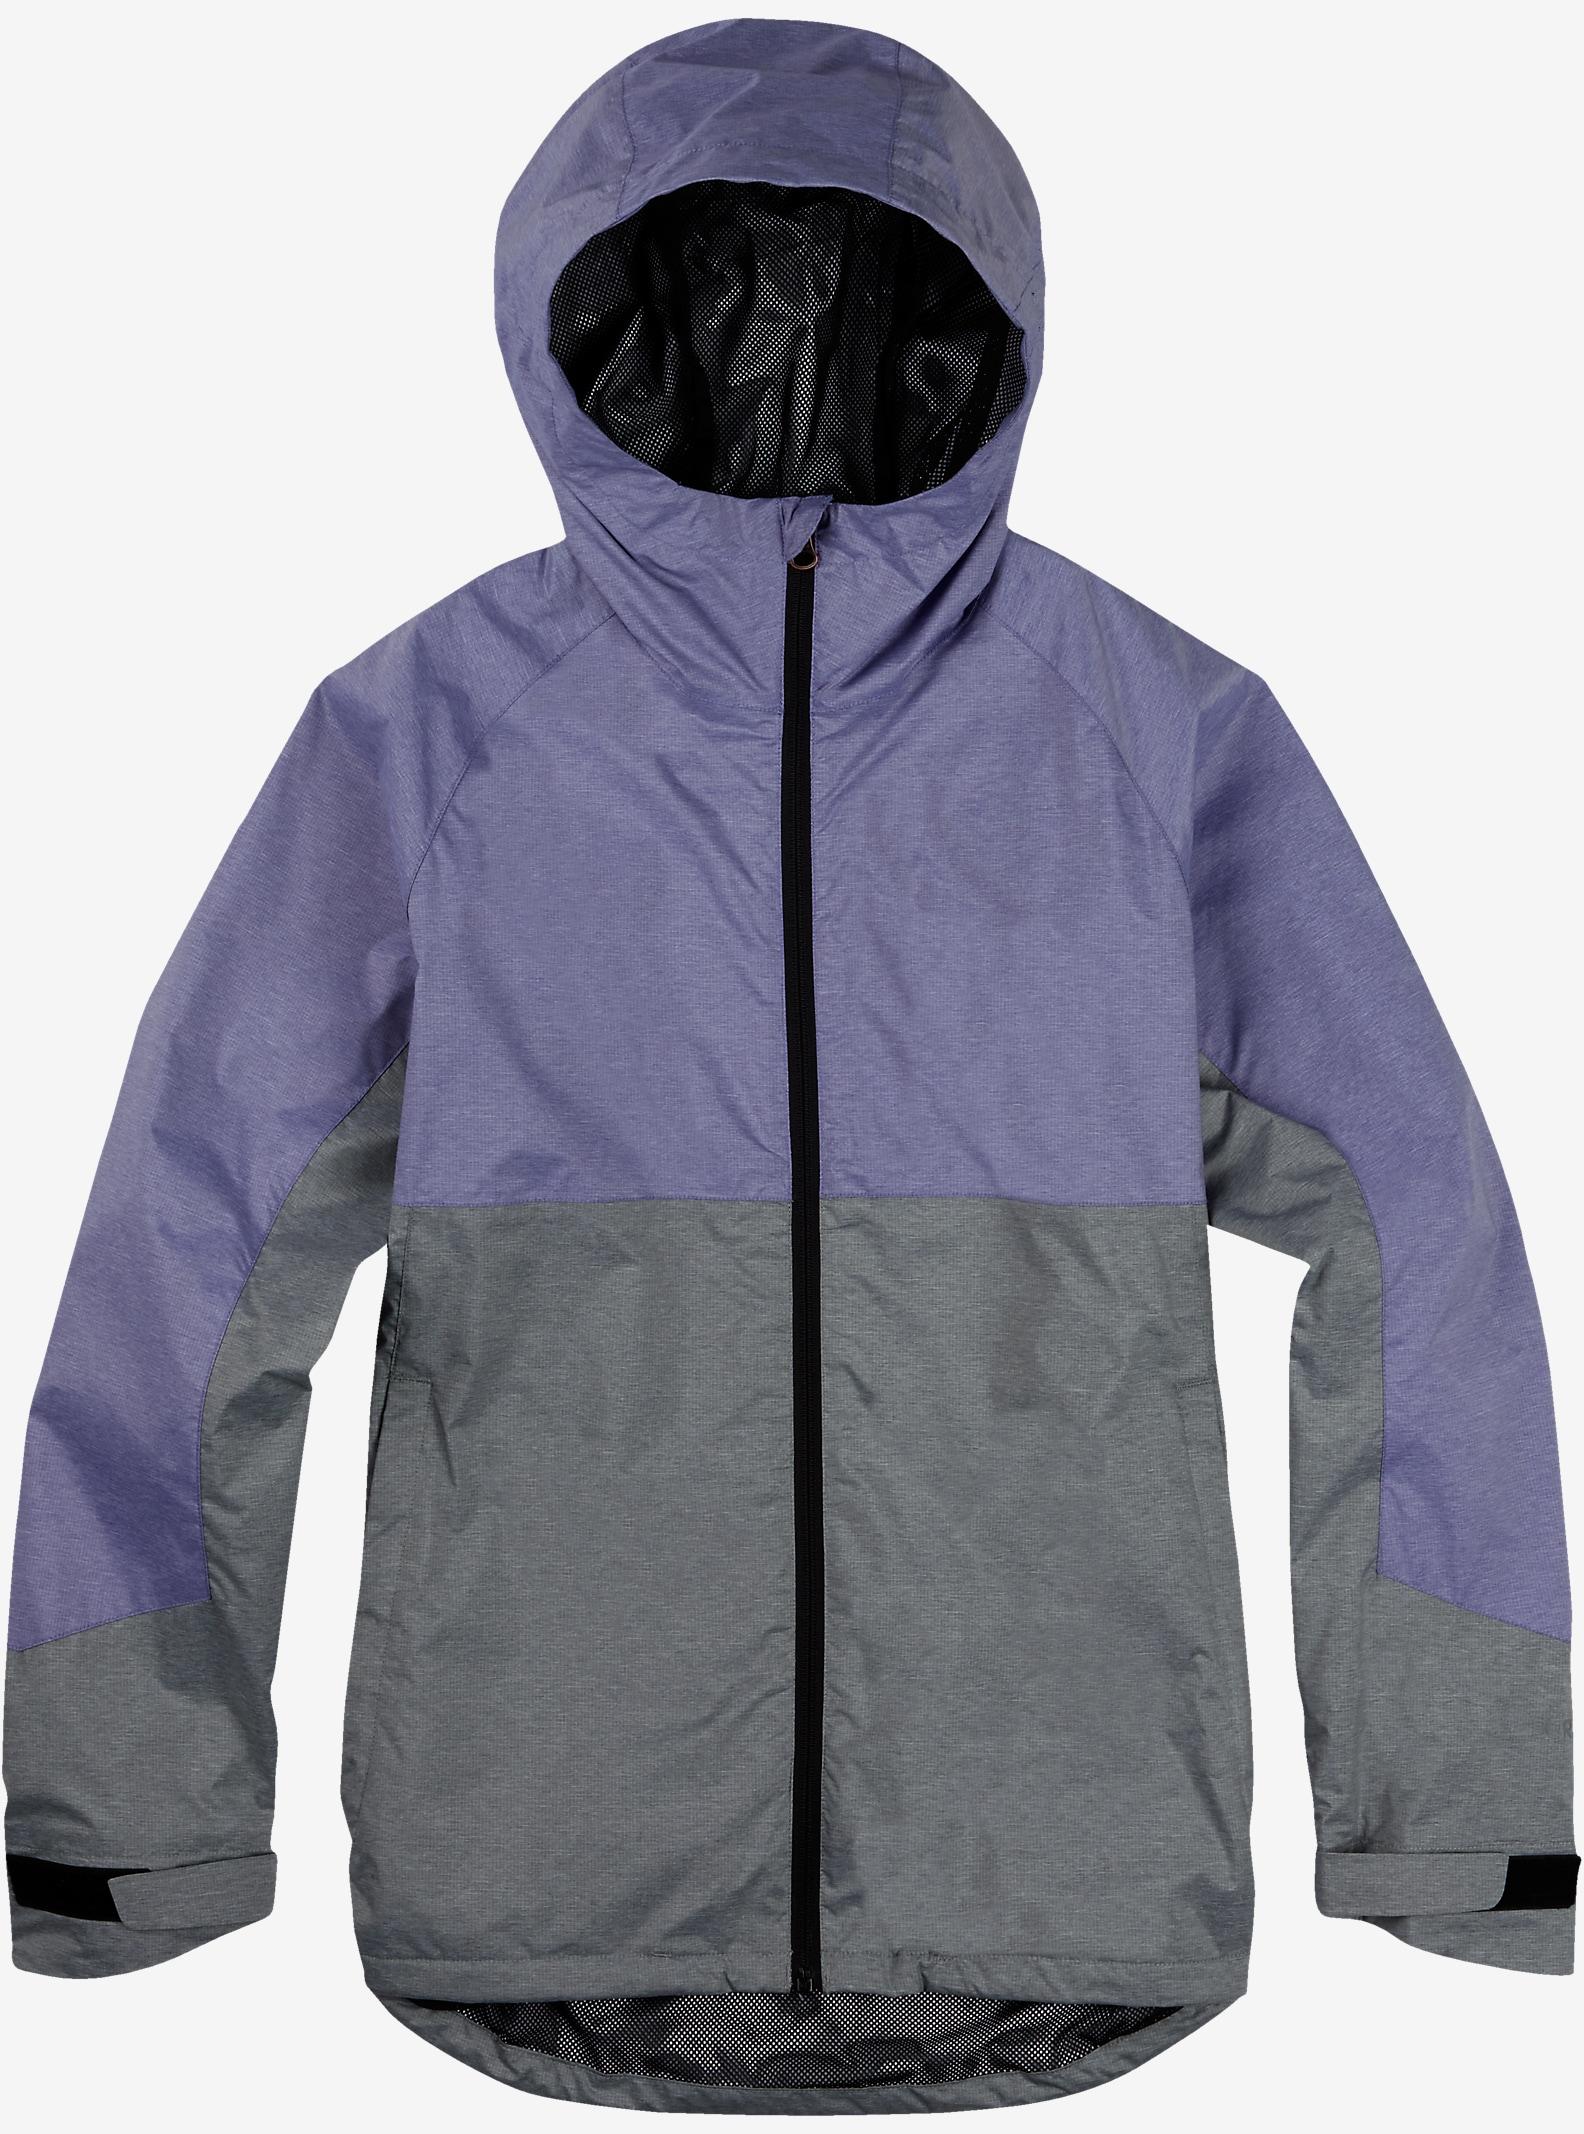 Burton Berkley Rain Jacket shown in Purple Heather